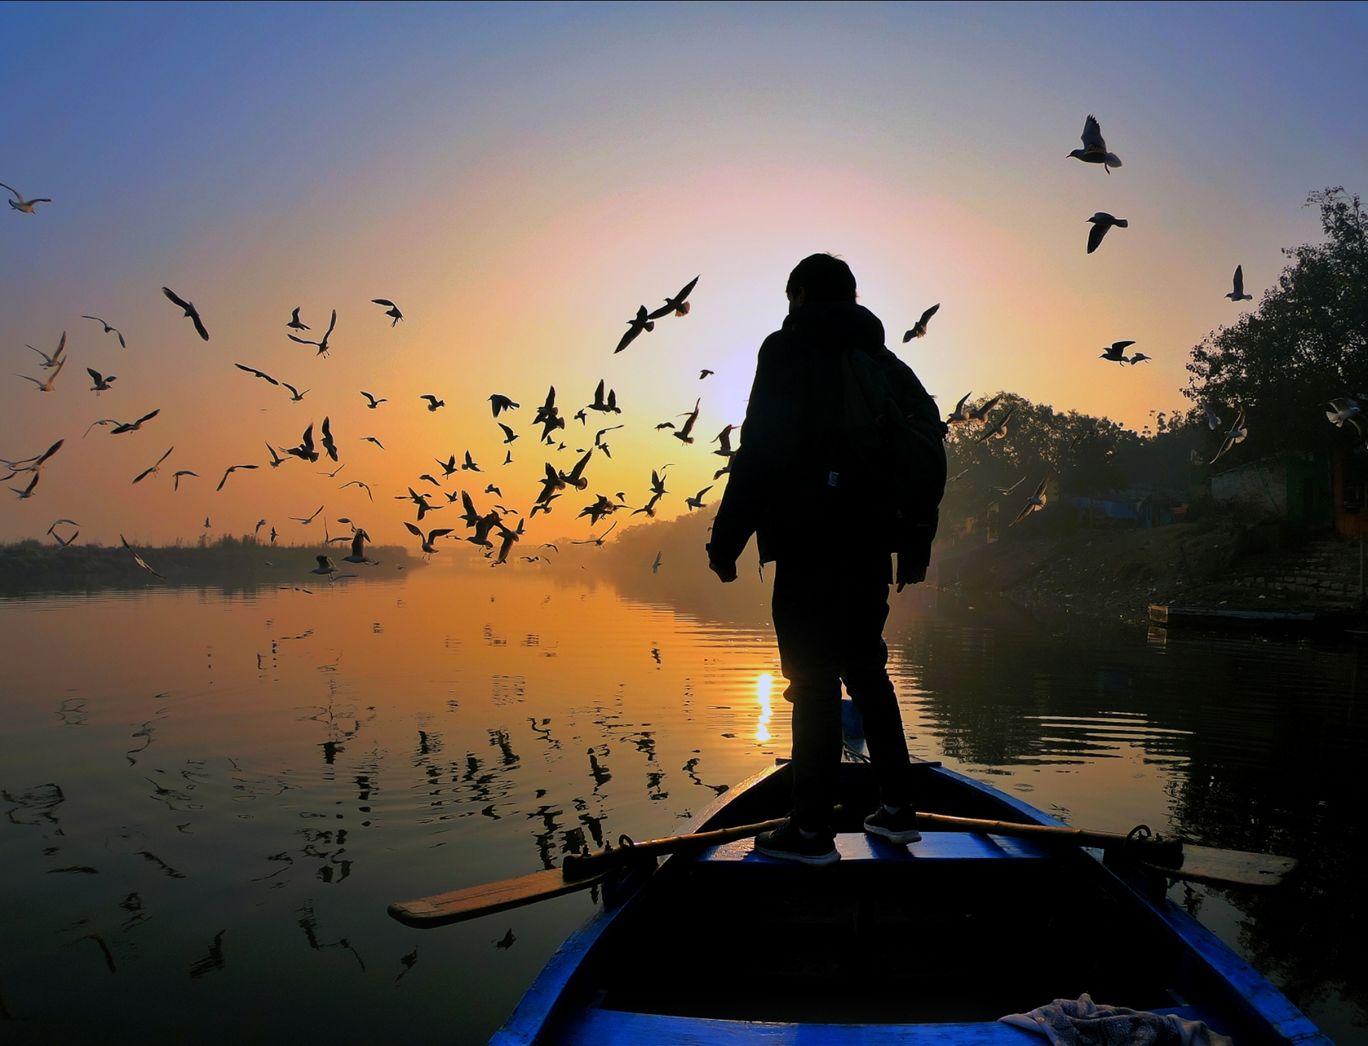 Photo of Delhi By Manish Kumar